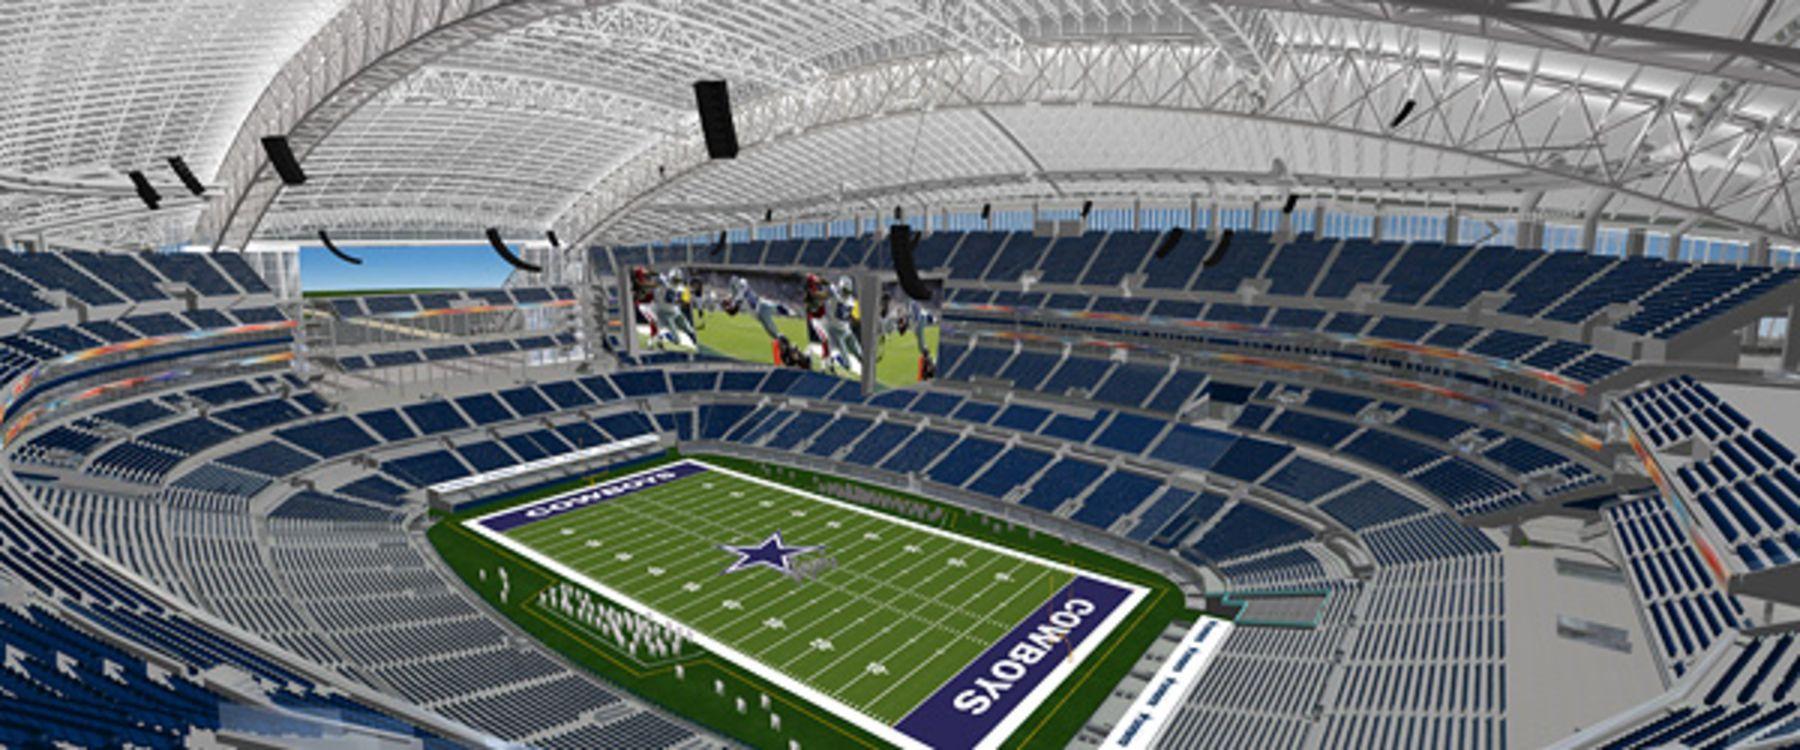 Unreal Architecture Cowboys stadium, Cowboy games